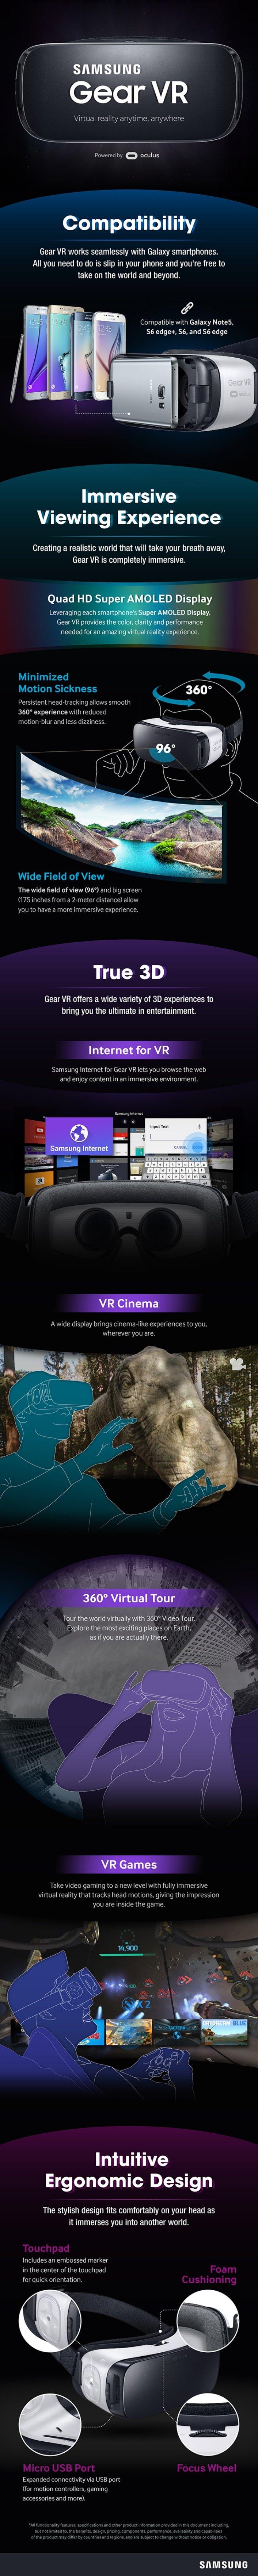 info gear VR